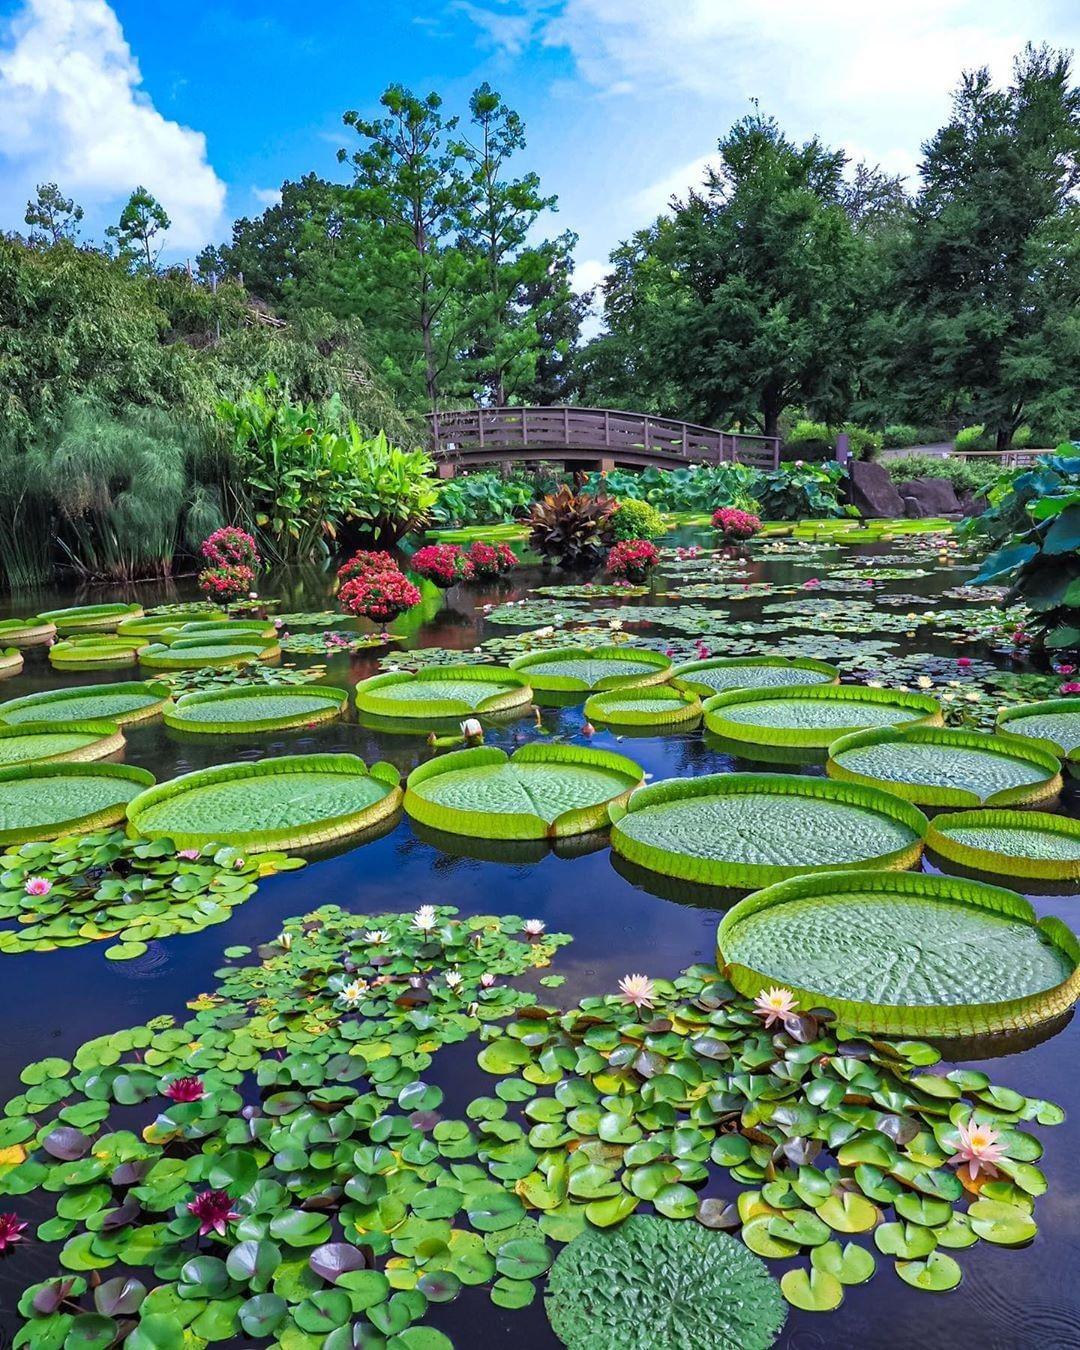 Japan Travel Shiga's Kusatsu Aquatic Botanical Garden is